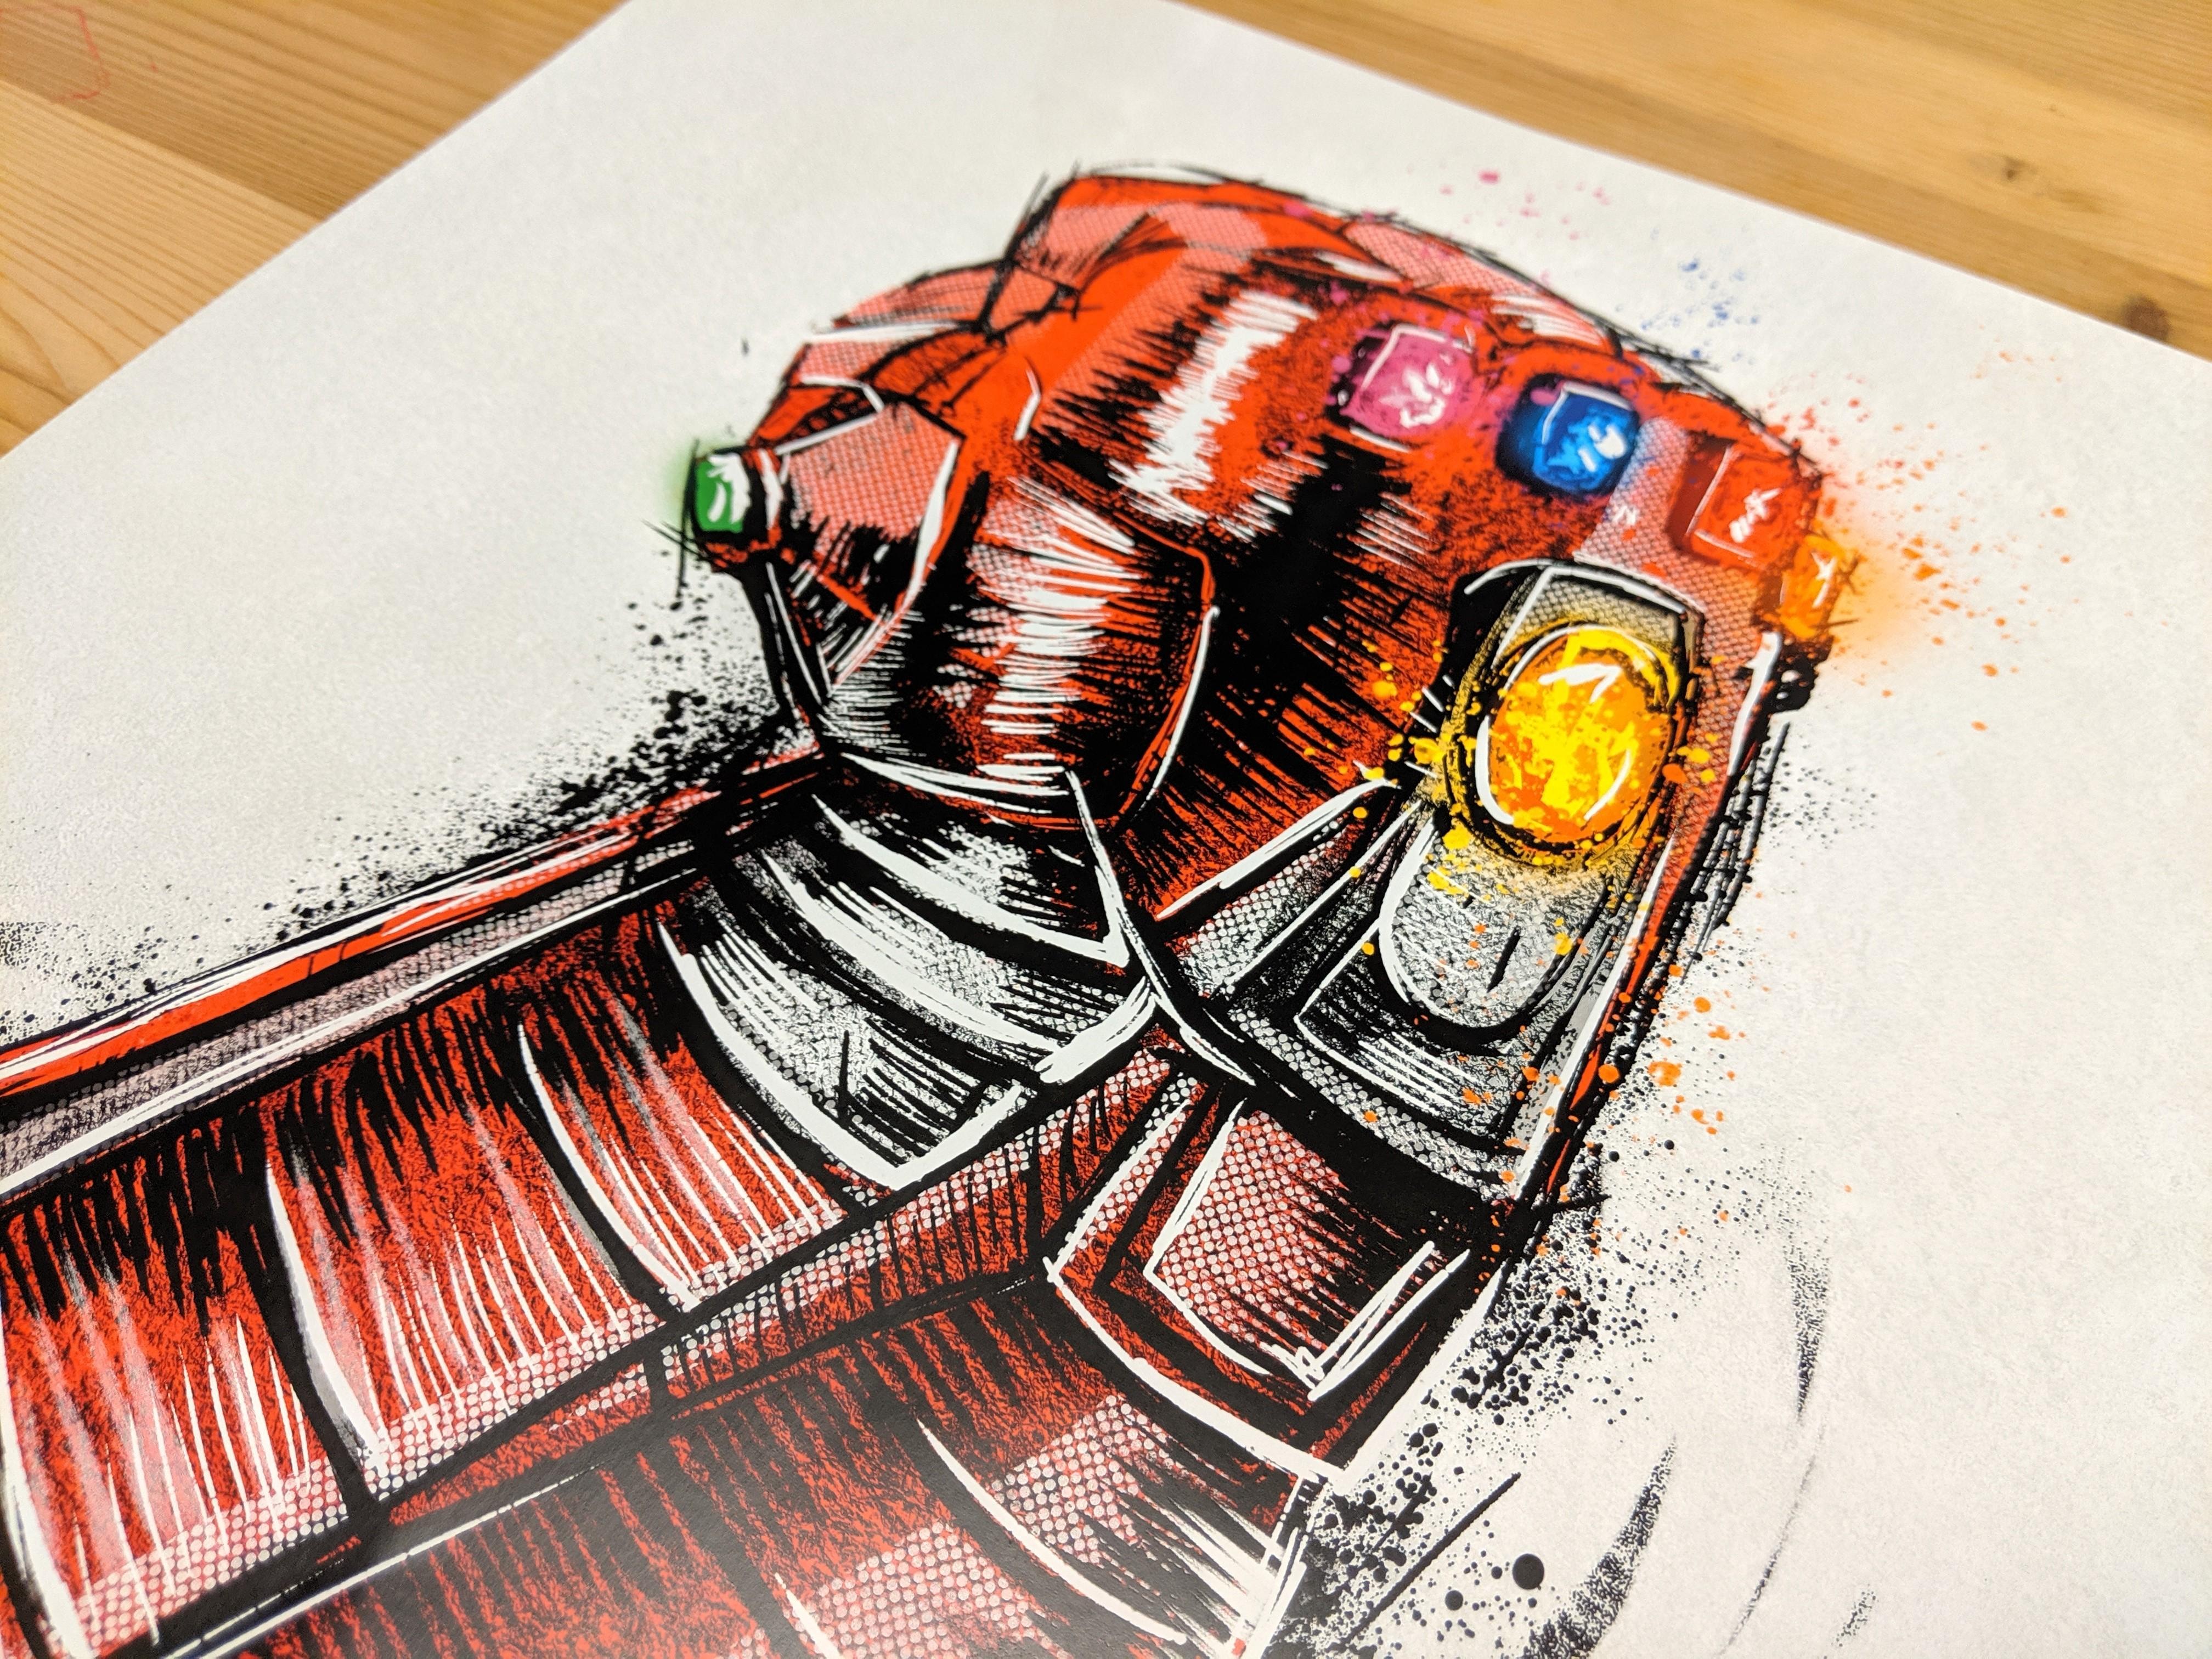 The Avengers, Illustration, Design, Graphics, Graphic design, Poster, Film, Clint Barton, Product design, Automotive design, design, Illustration, Art, Drawing, Graphic design, Sketch, Watercolor paint, Visual arts, Graphics, Artwork, Paint